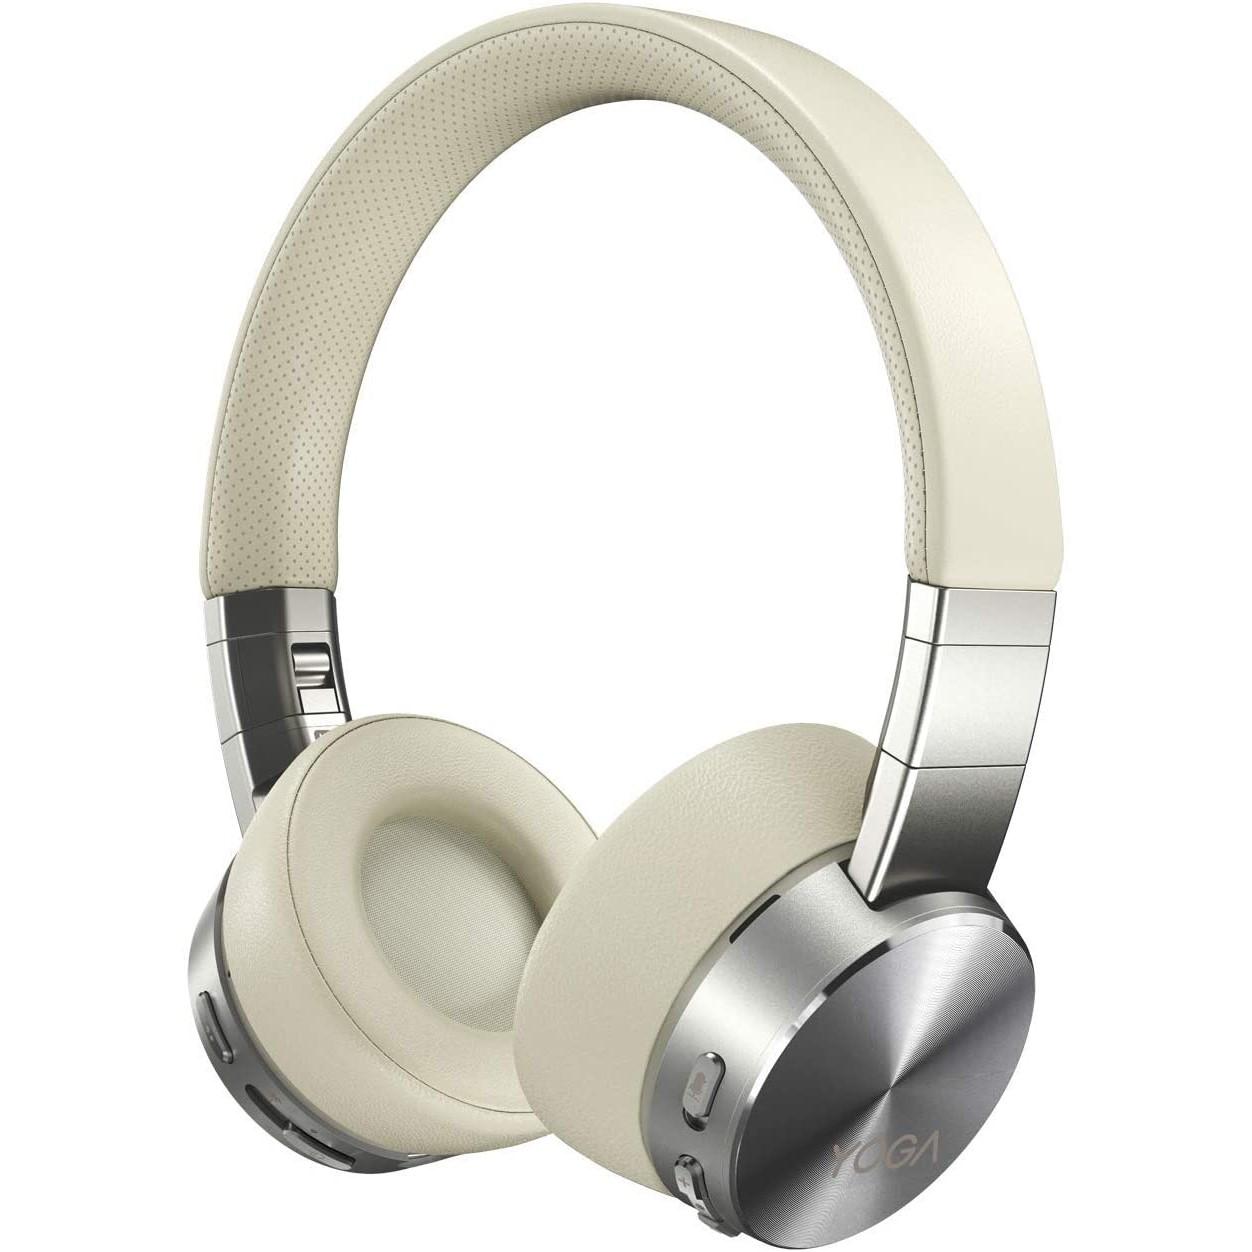 Lenovo Yoga Active Noise Cancellation Headphones GXD0U47643